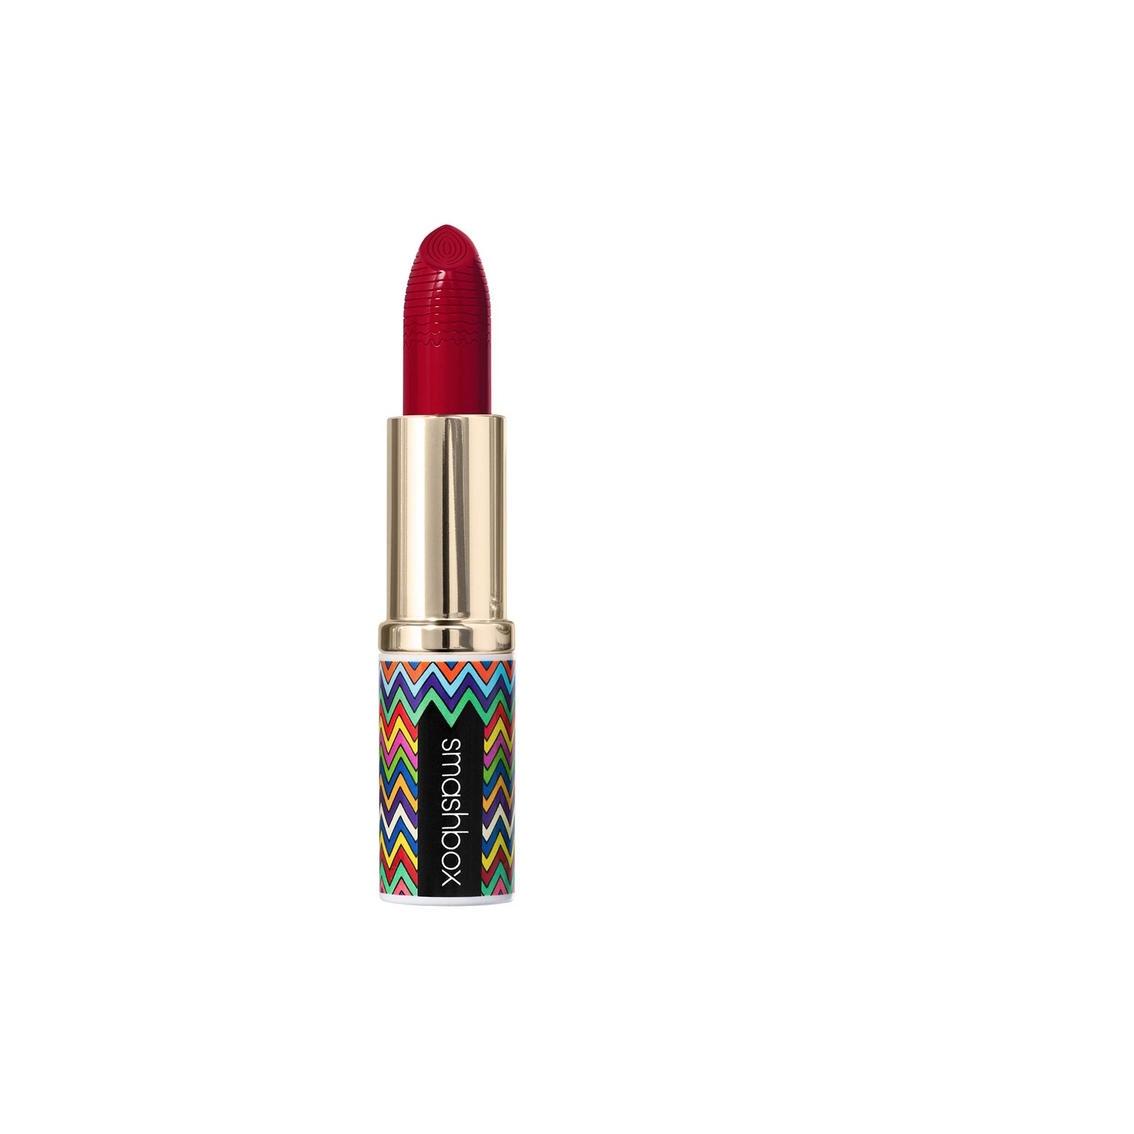 Smashbox Be Legendary Lipstick Legendary Holidaze Collection